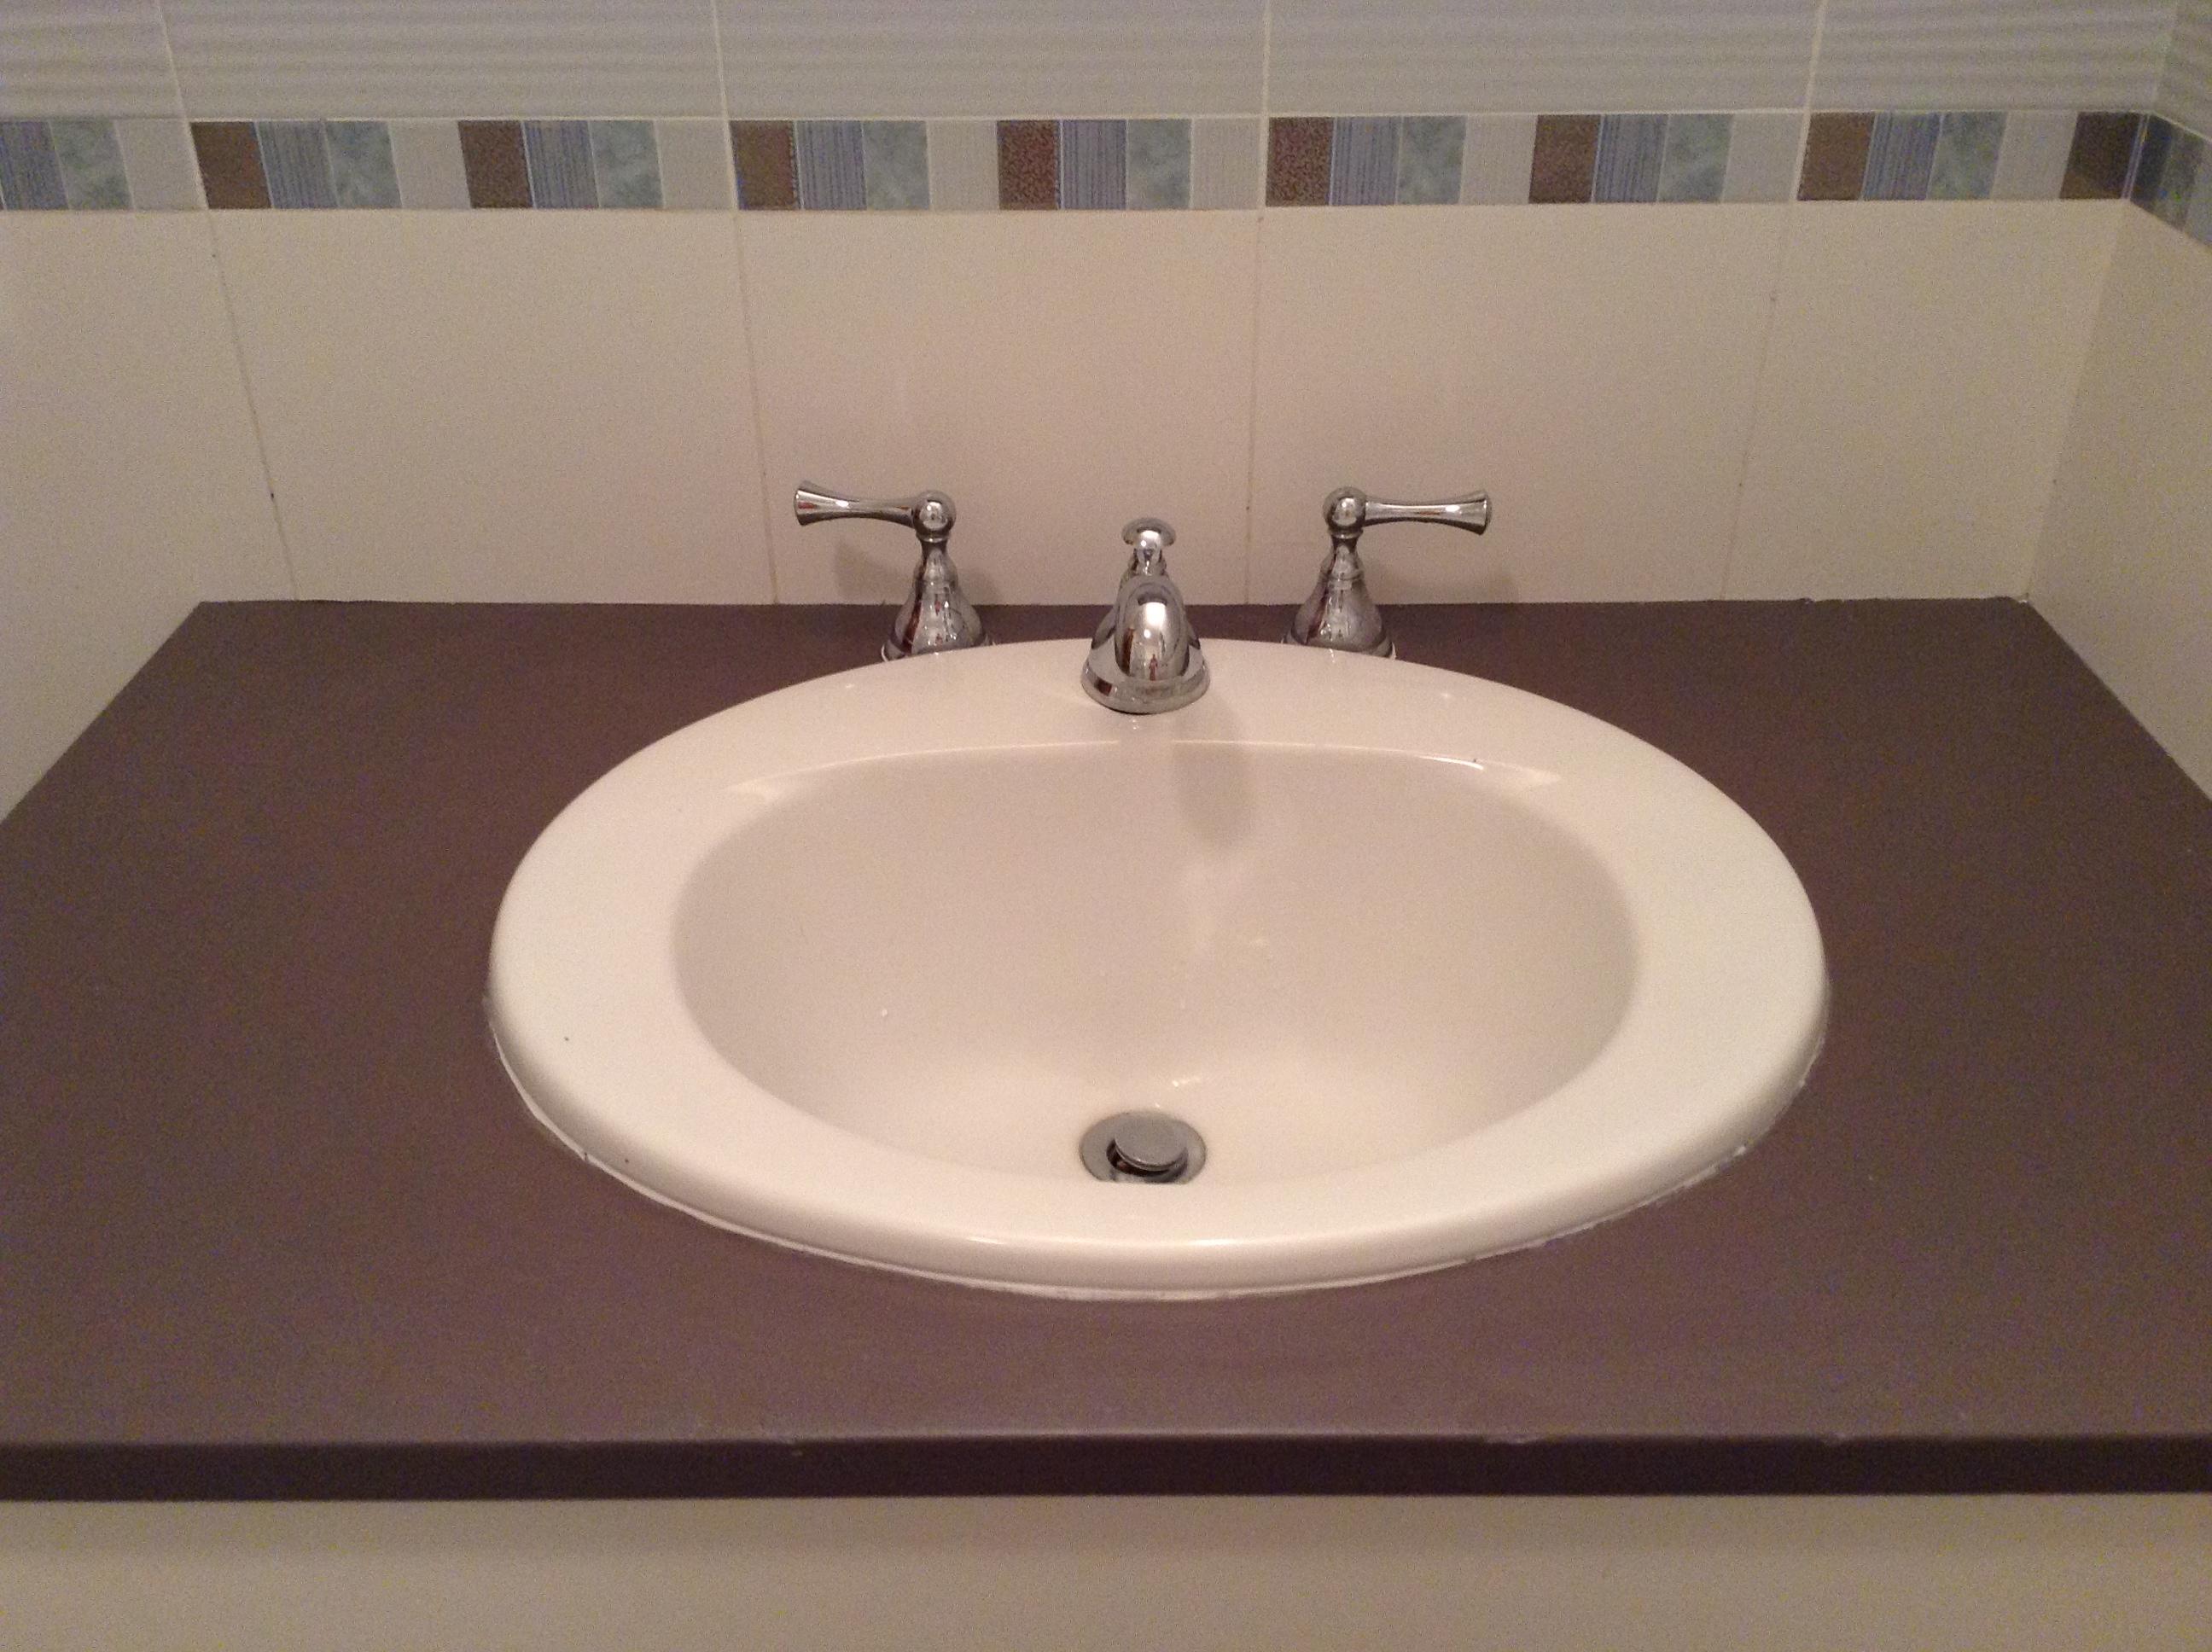 Bathroom Facelift - Part 2 - ROWE SPURLING PAINT COMPANY